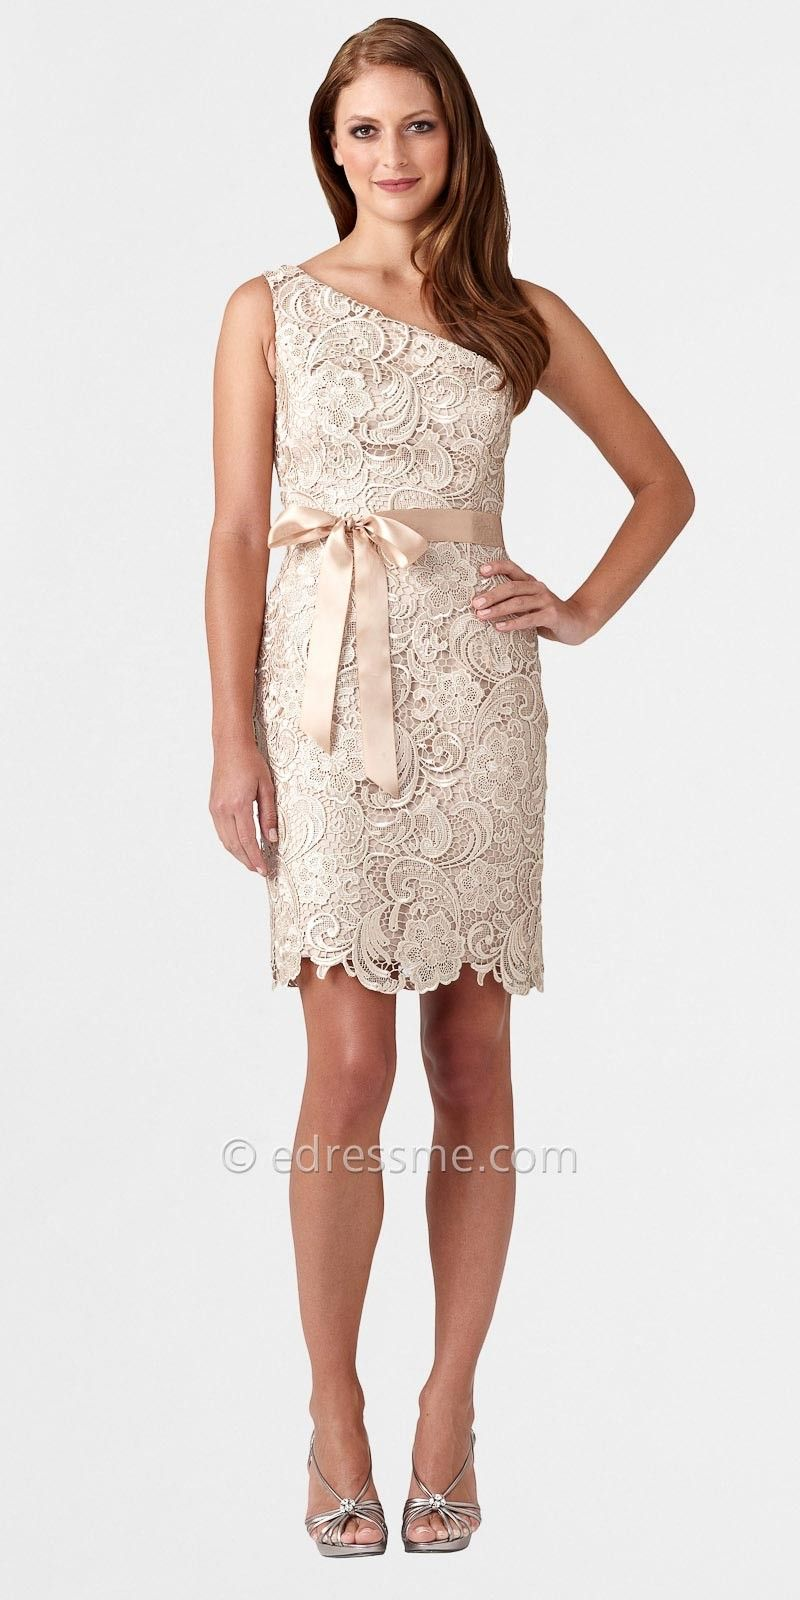 Medium Of Lace Cocktail Dress